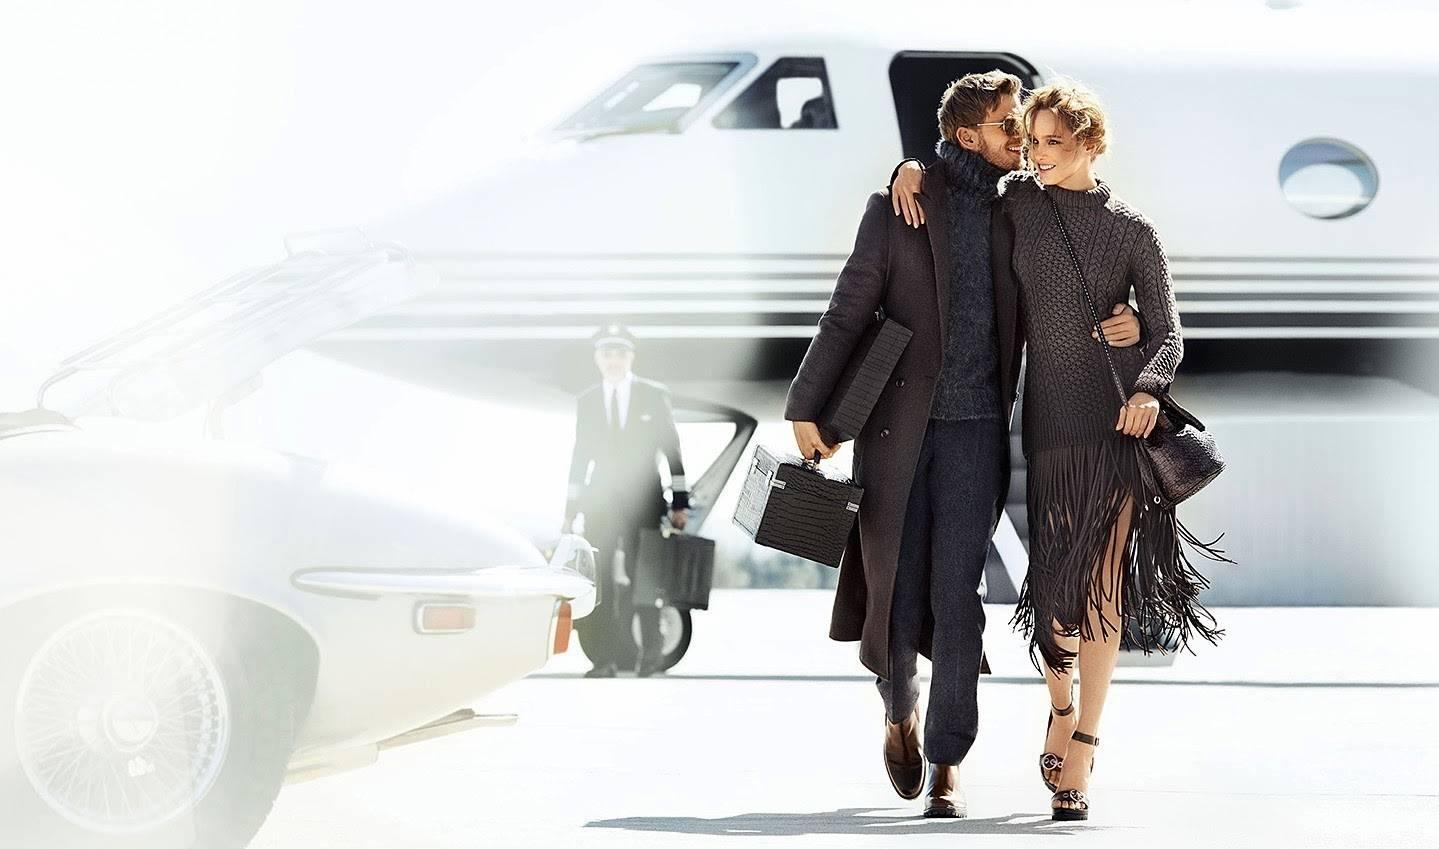 dicas viagem viajar jet lag jetlag sugarbaby sugardaddy casalsugar mundosugar relacionamentosugar sugar casal mundo relacionamento